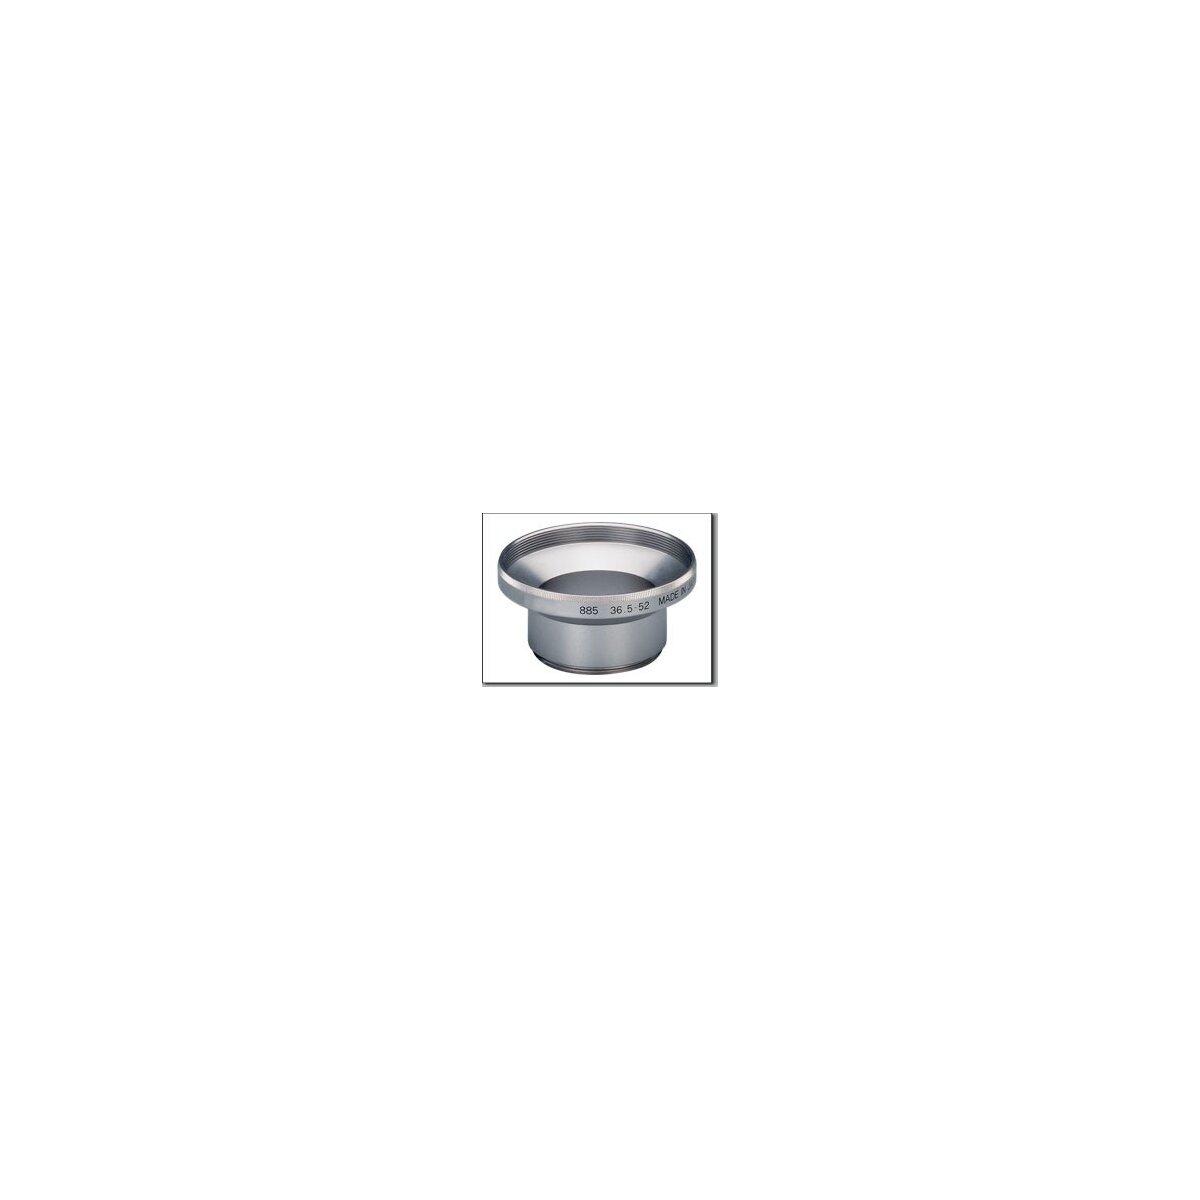 Anschlussring fuer Nikon Coolpix 885 und 4300 ( Tubus , Anschlußtubus , Adapter , Adapterring ) Soligor 57965